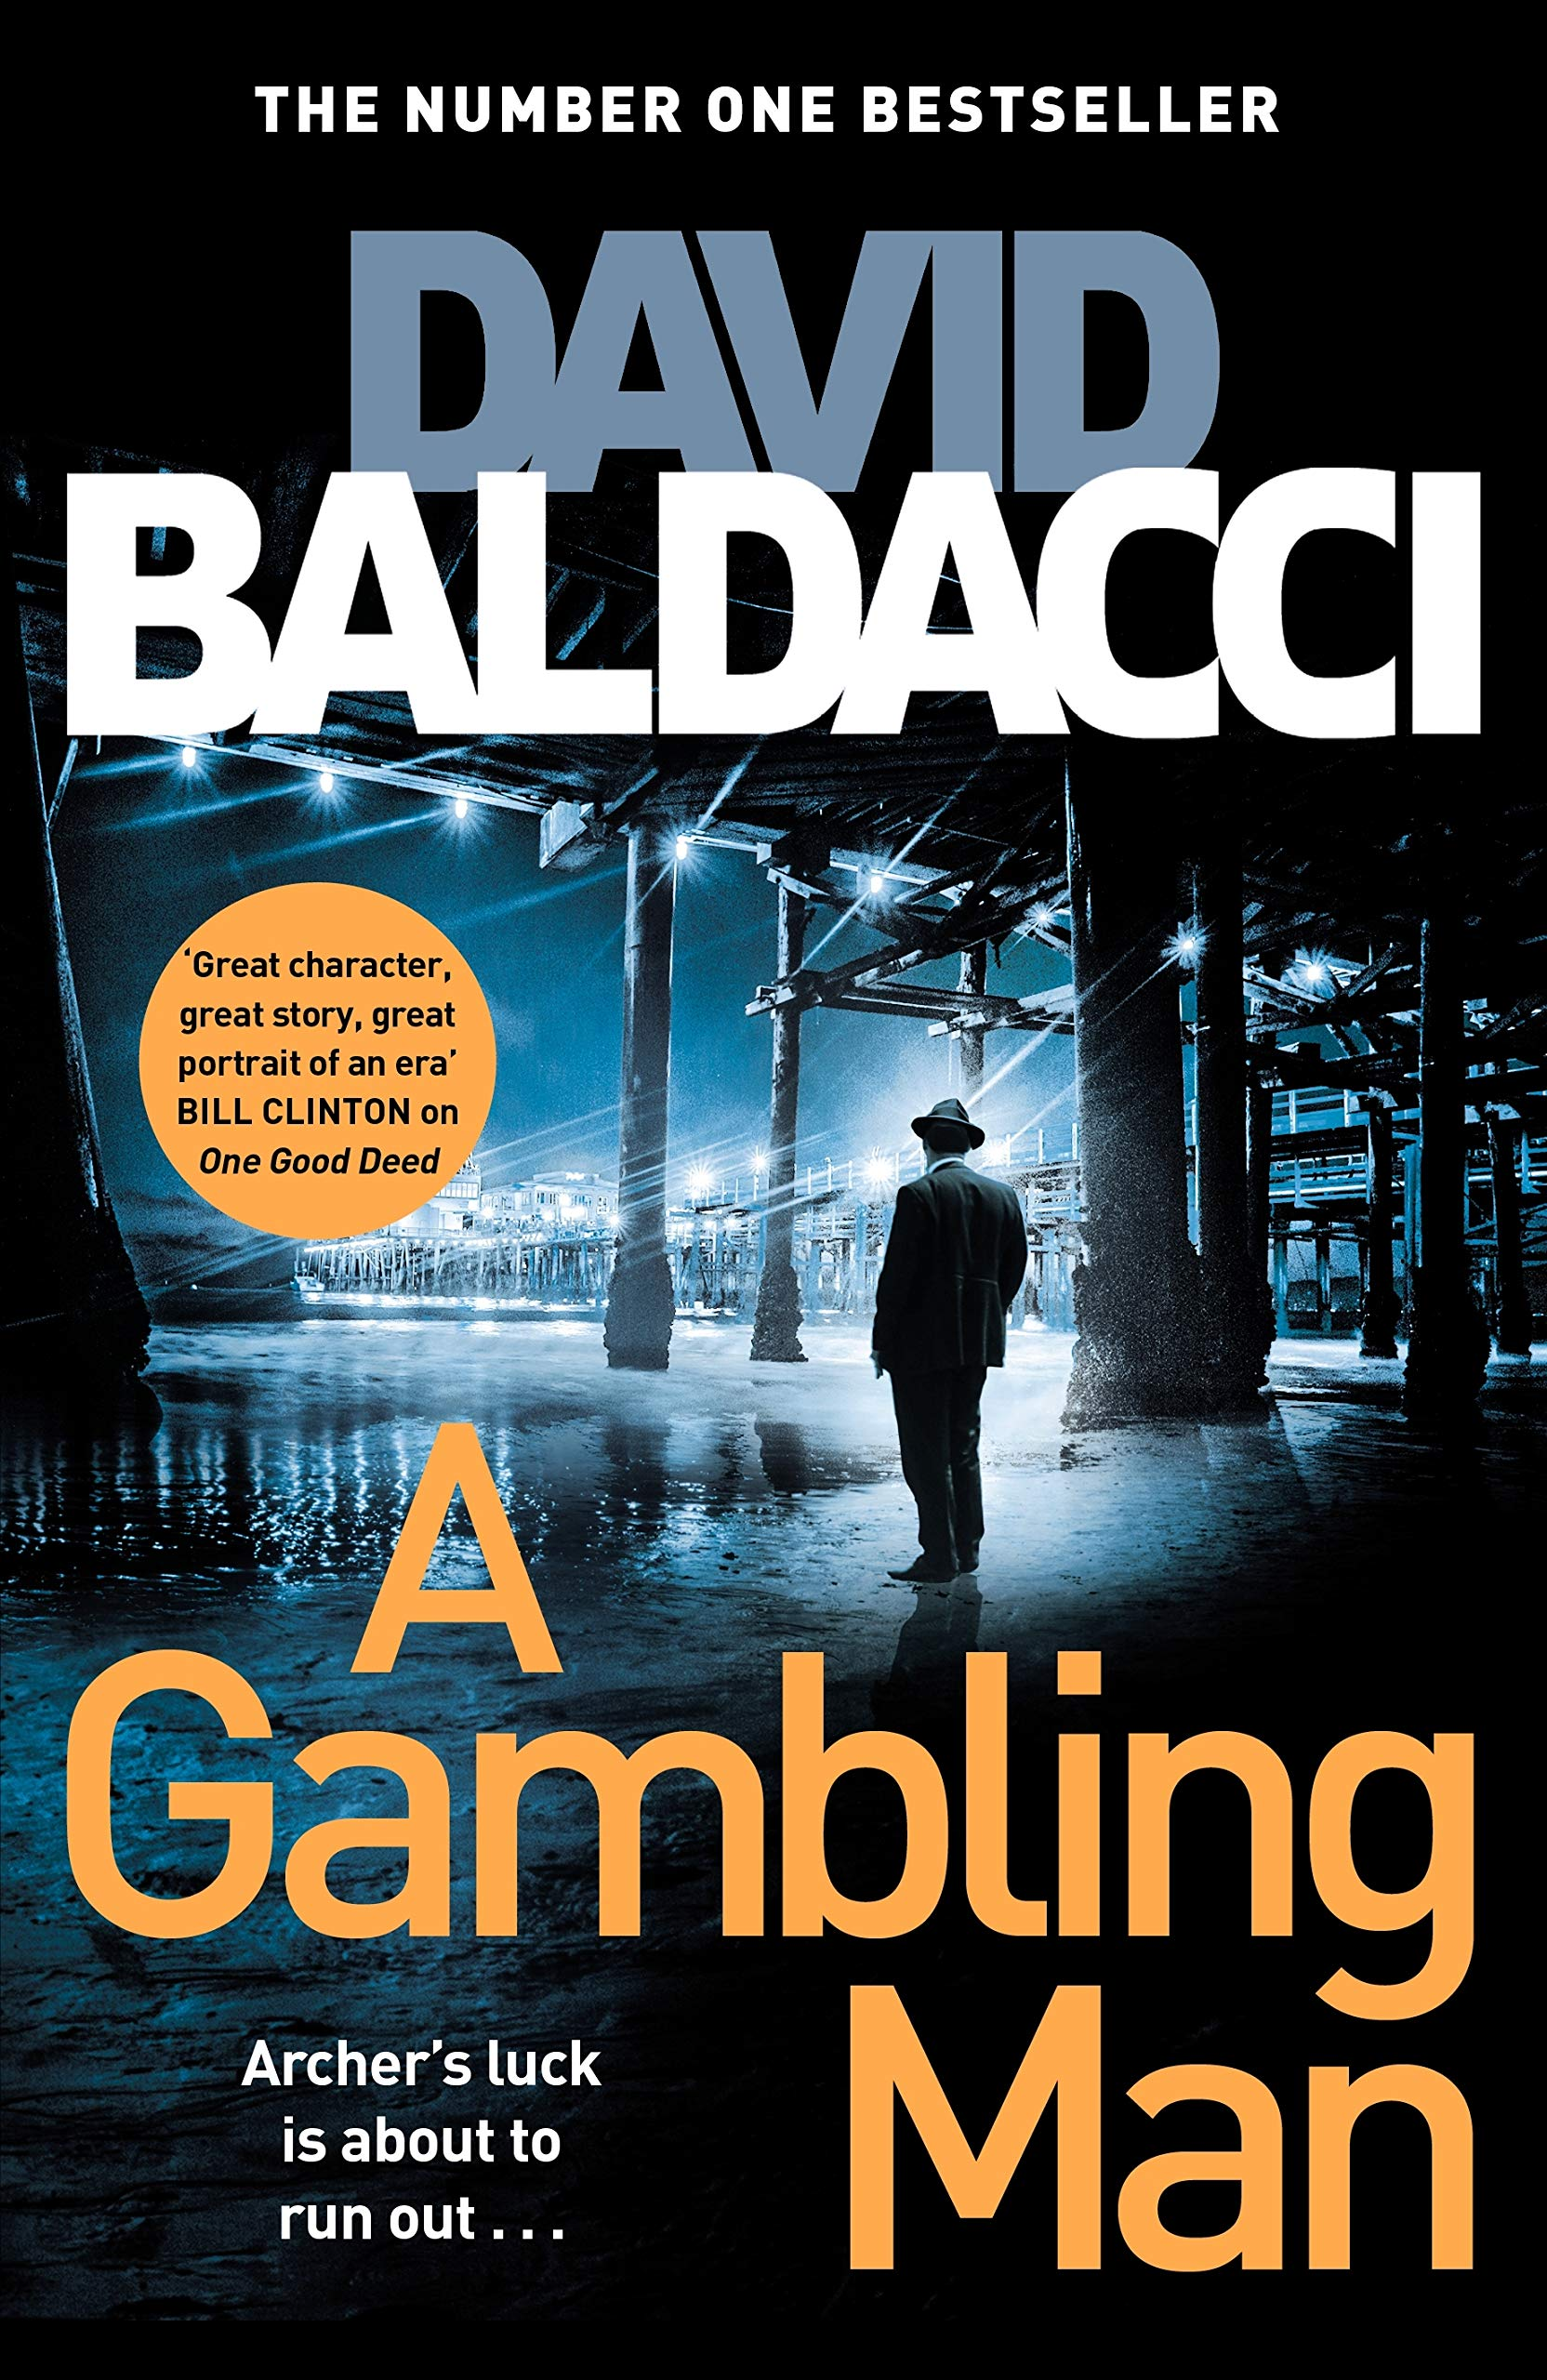 A Gambling Man (Aloysius Archer series): Amazon.in: Baldacci, David: Books